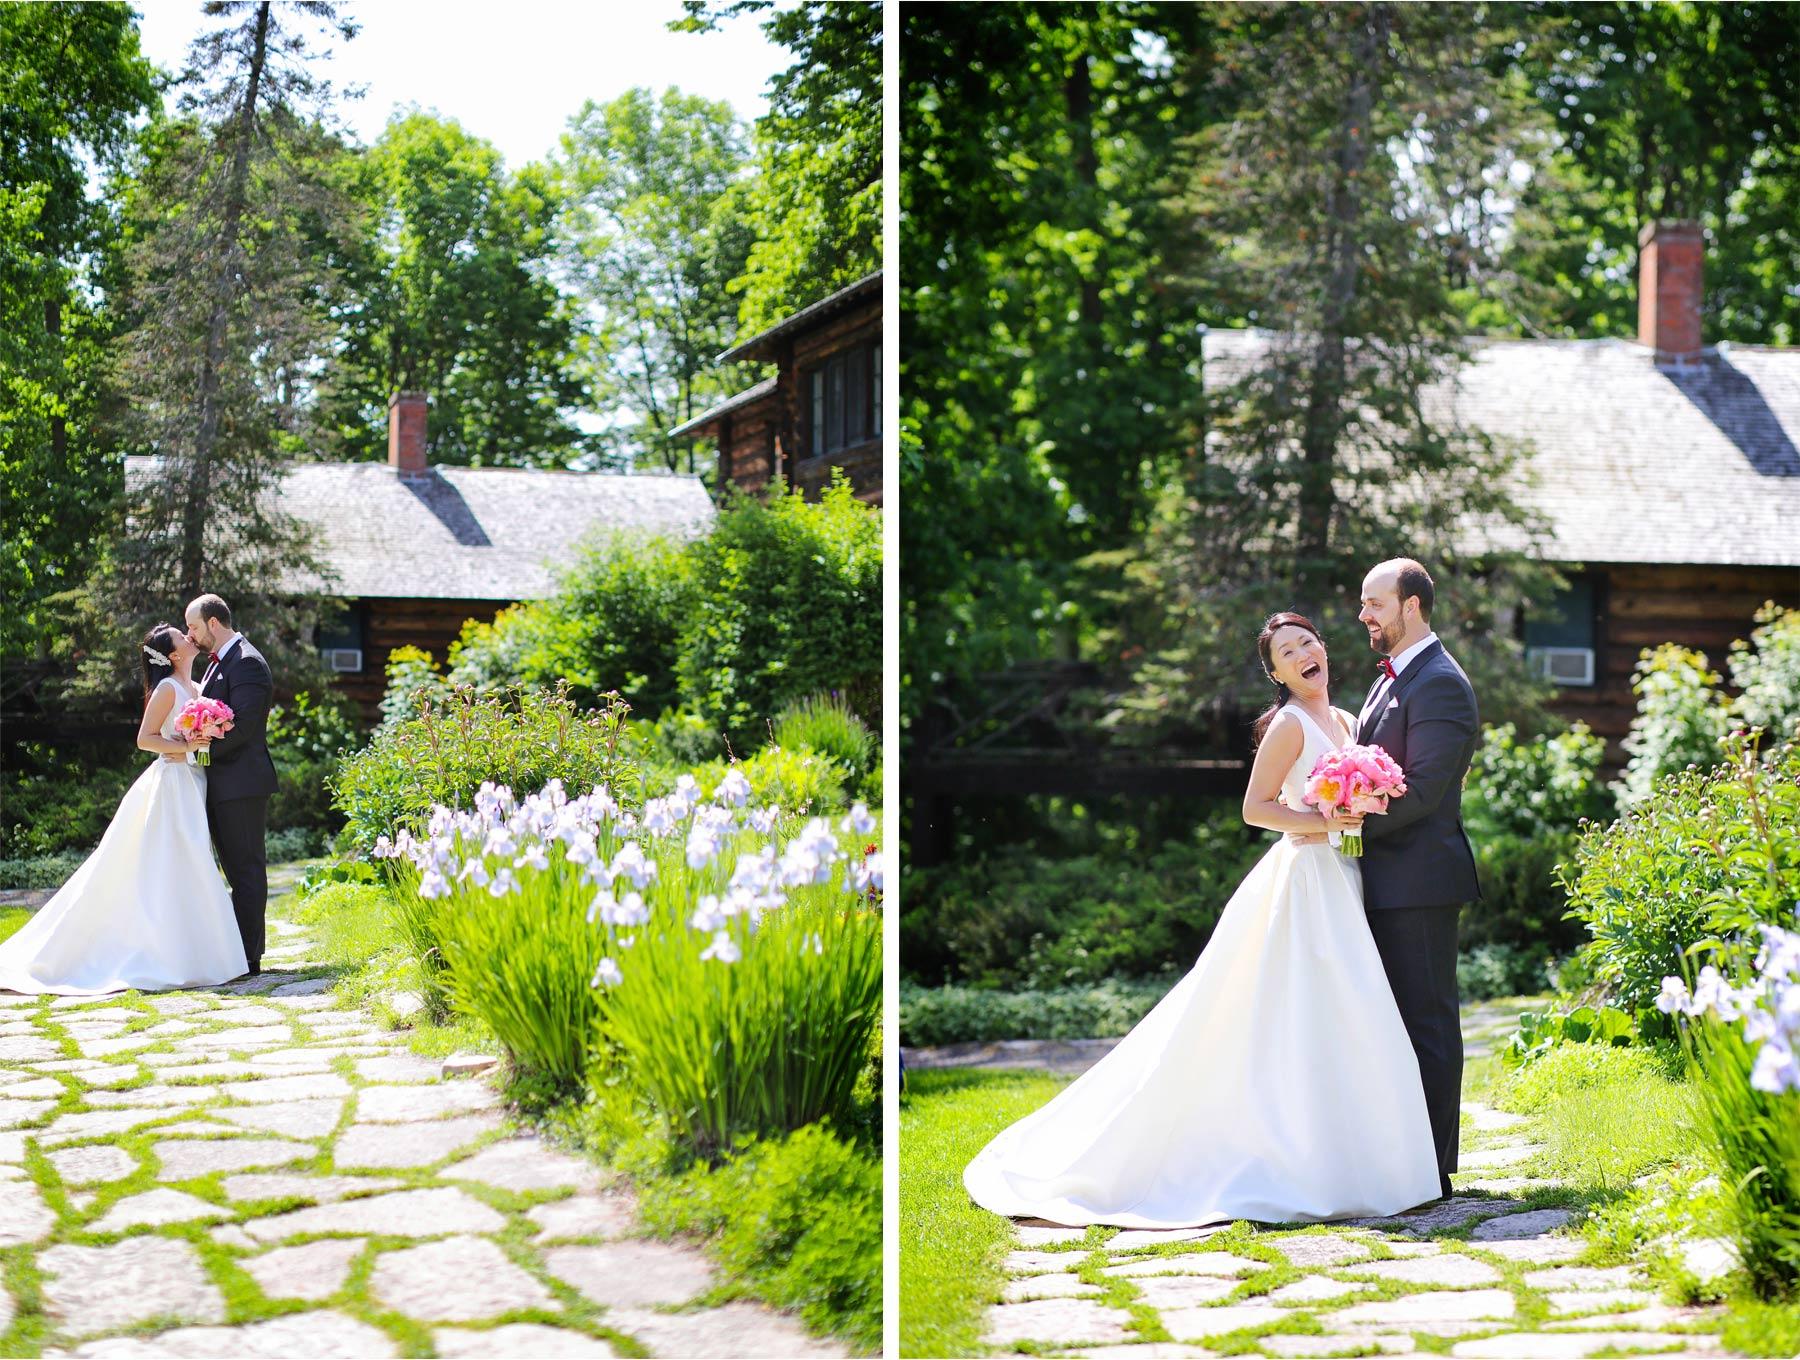 10-Vick-Photography-Wedding-Stouts-Island-Lodge-Wisconsin-Summer-First-Look-Garden-Groom-Bride-MiJa-and-Lucius.jpg